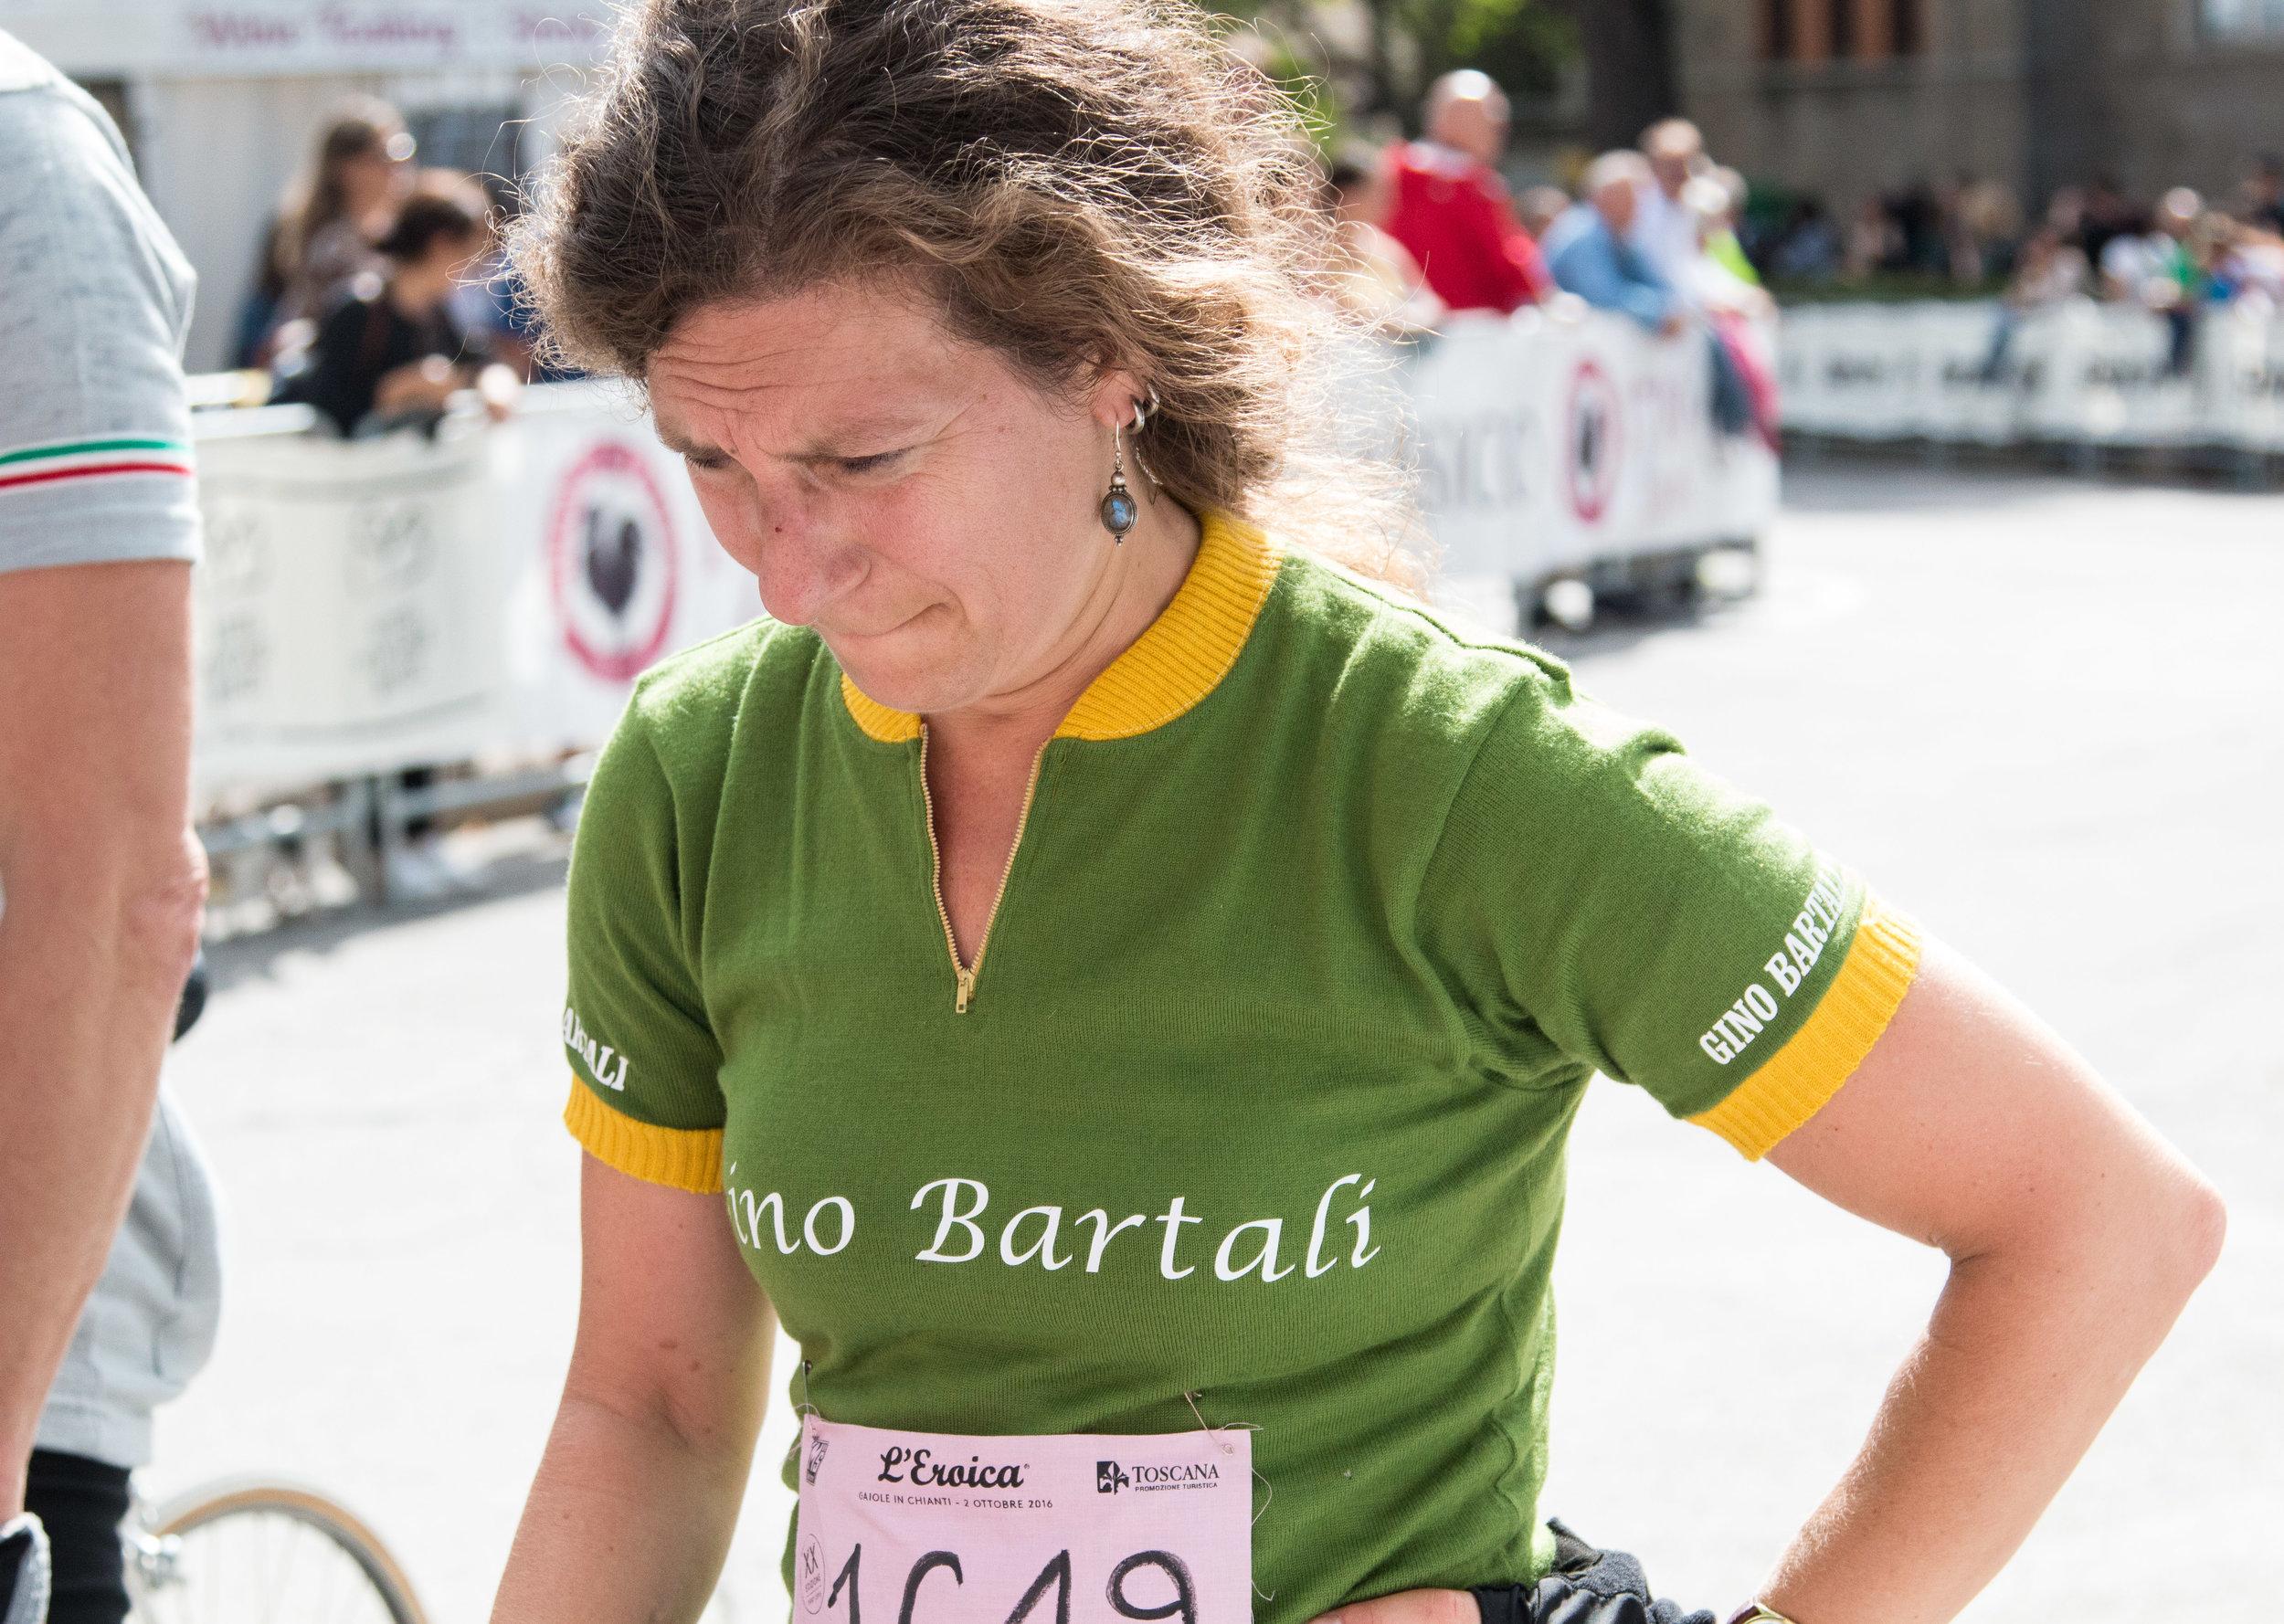 Squadra Bartali at the finish